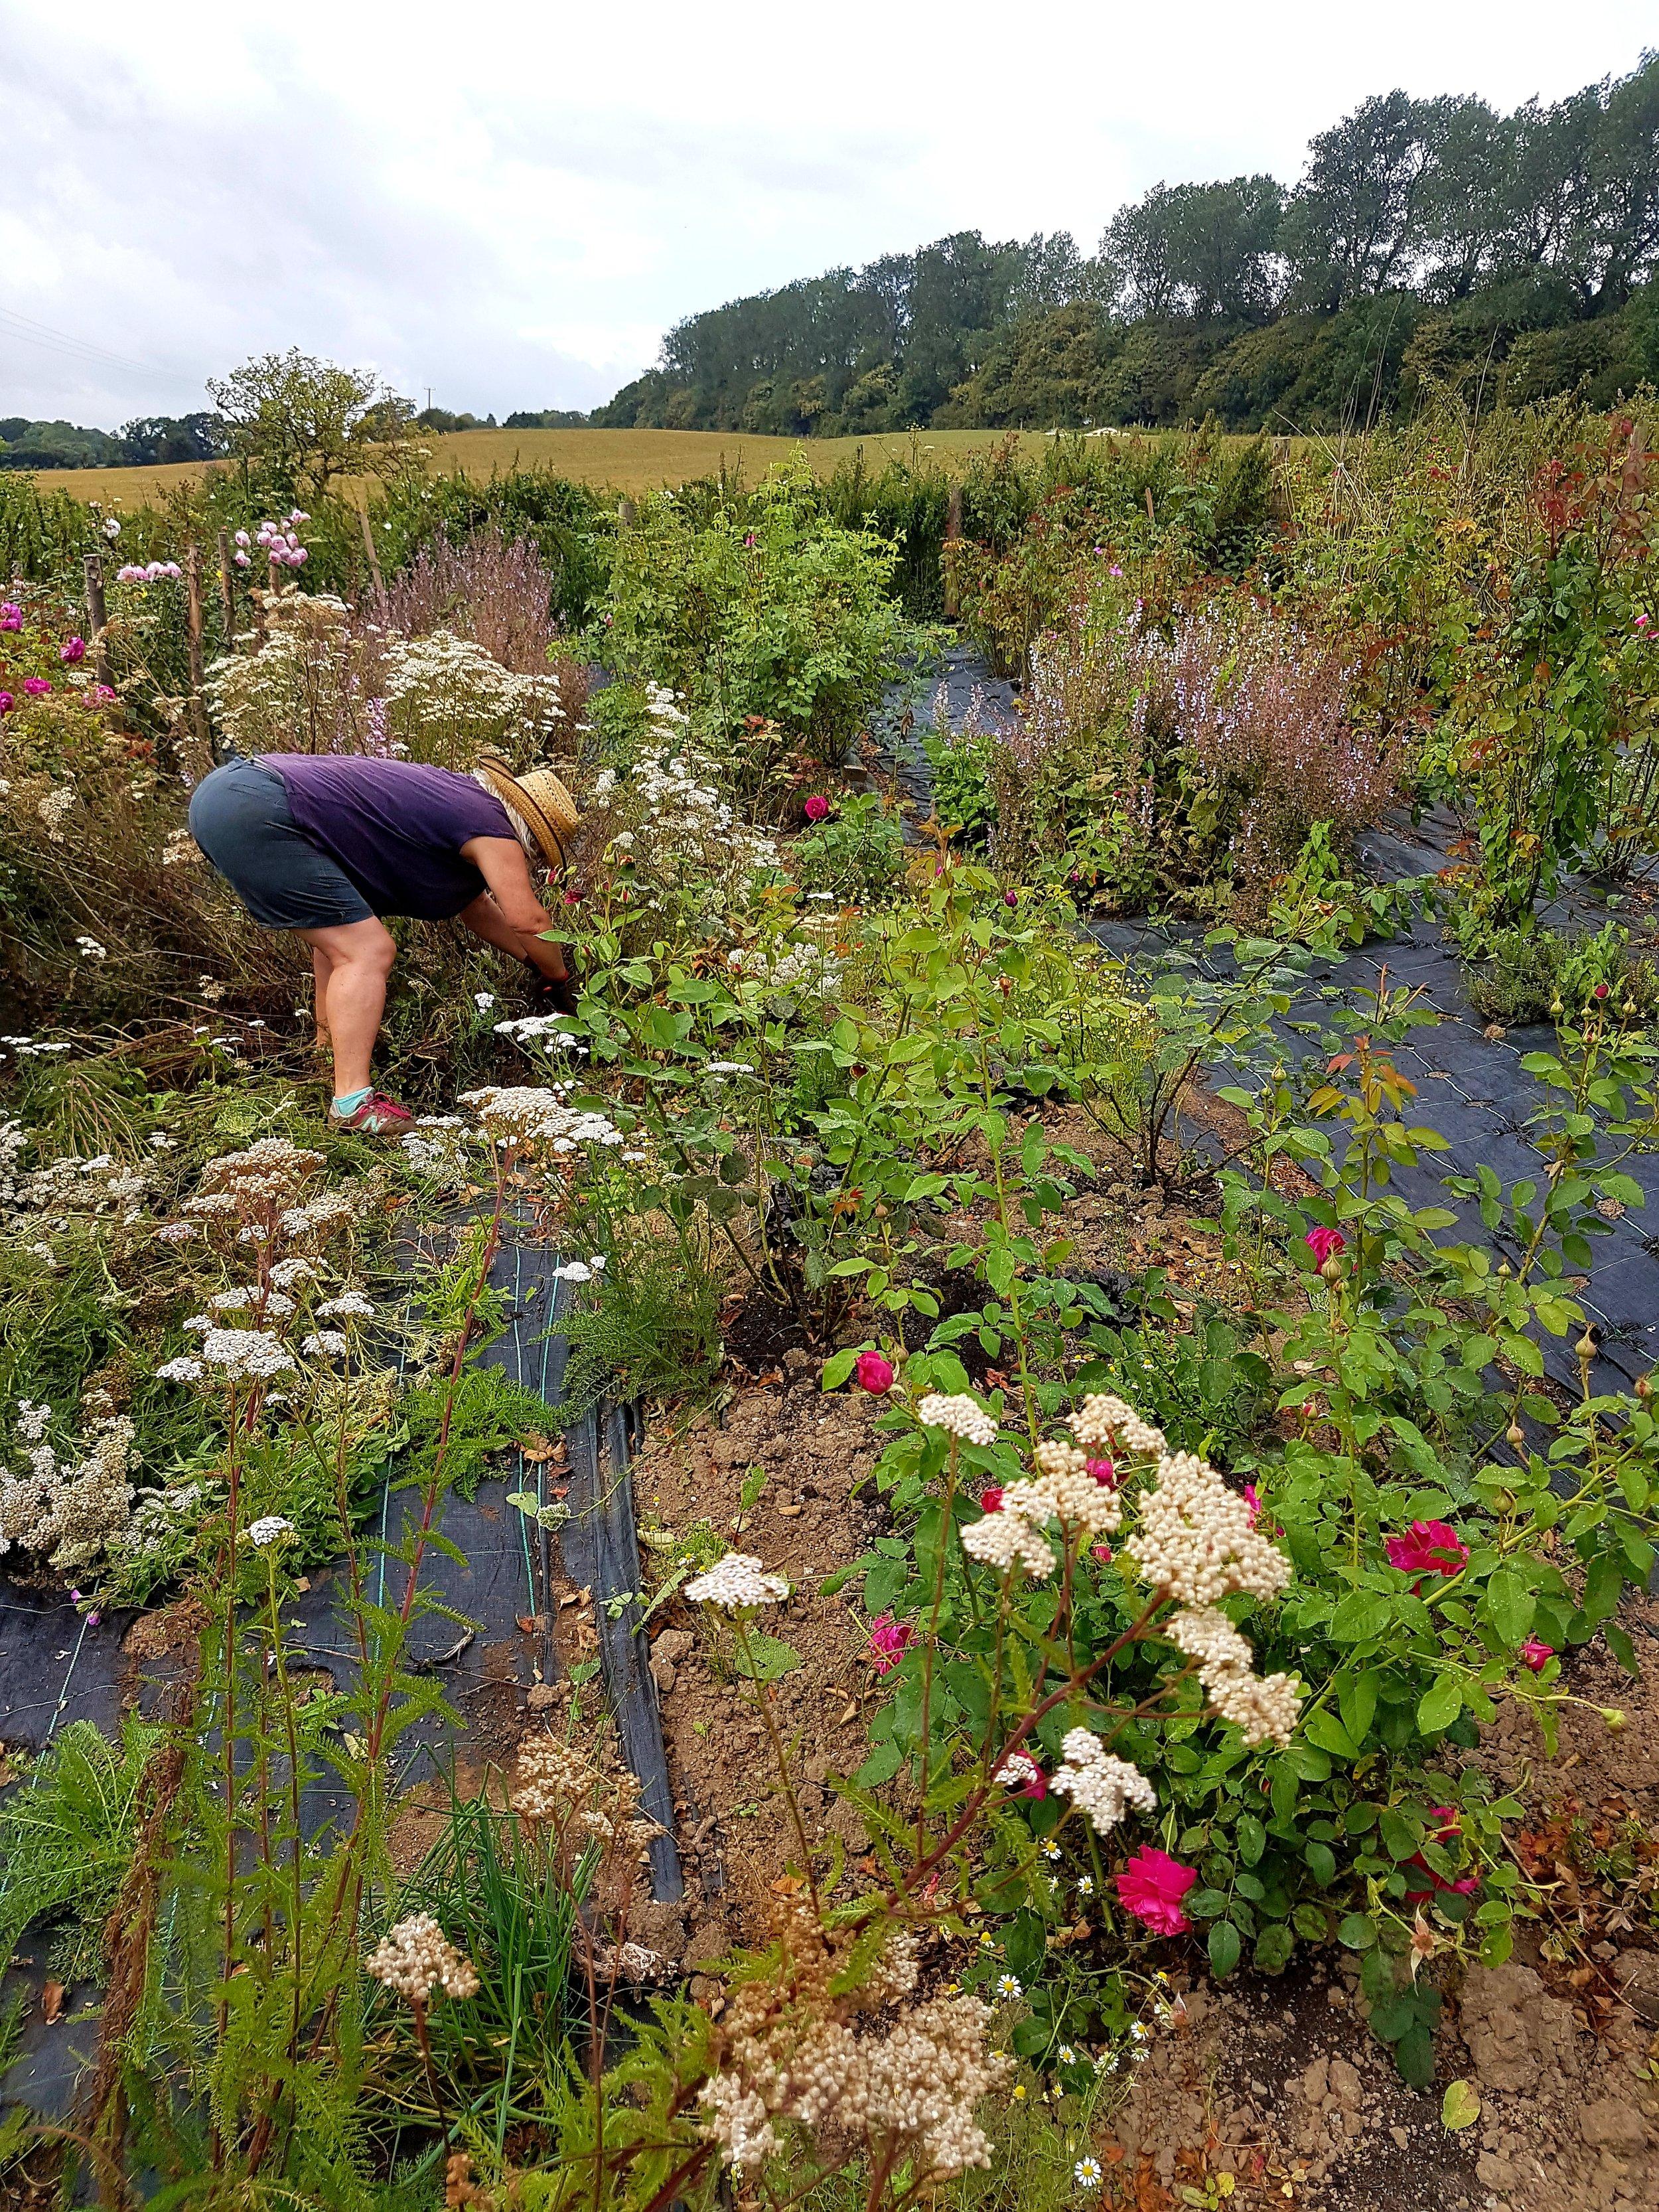 Miranda weeding between plants